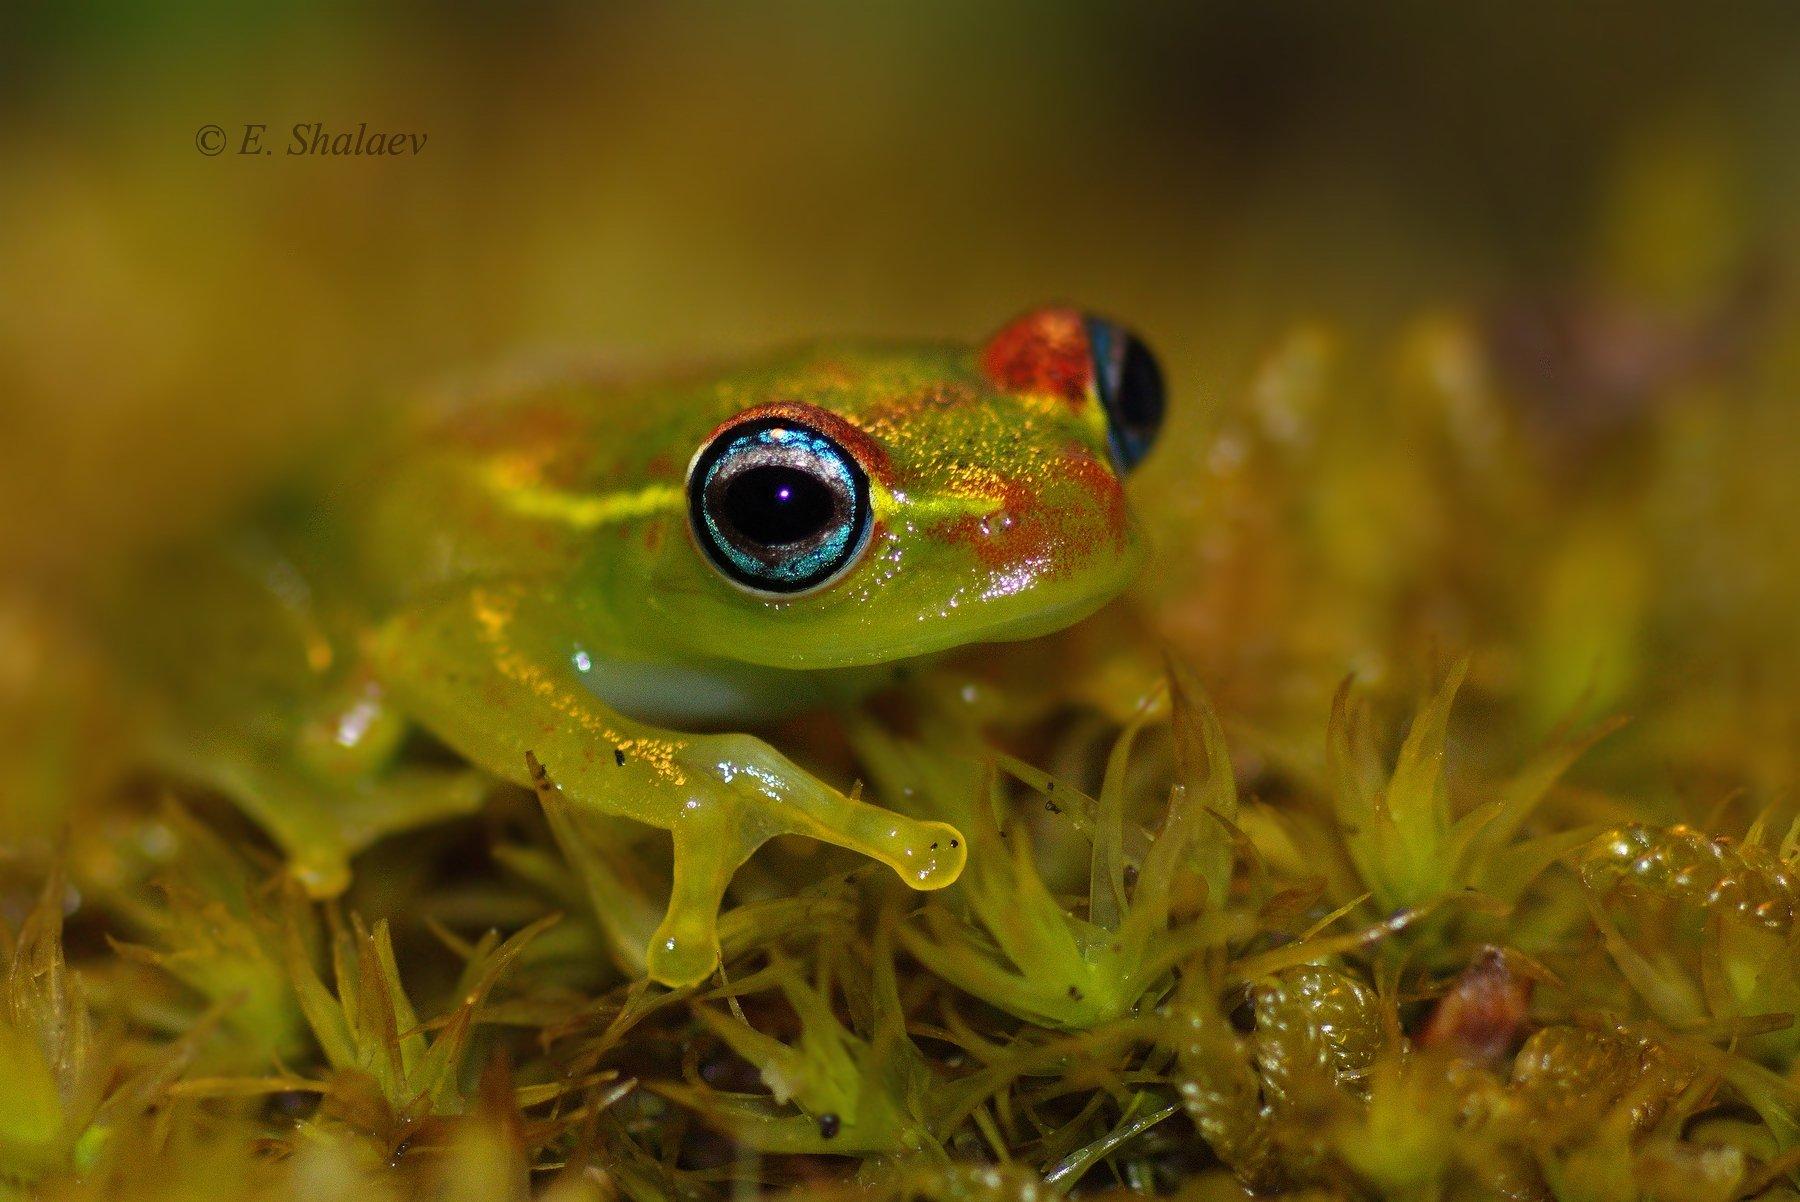 boophis viridis,frog, green bright-eyed frog,амфибии,боофис,веслоног зелёный, веслоног,лягушка, Евгений